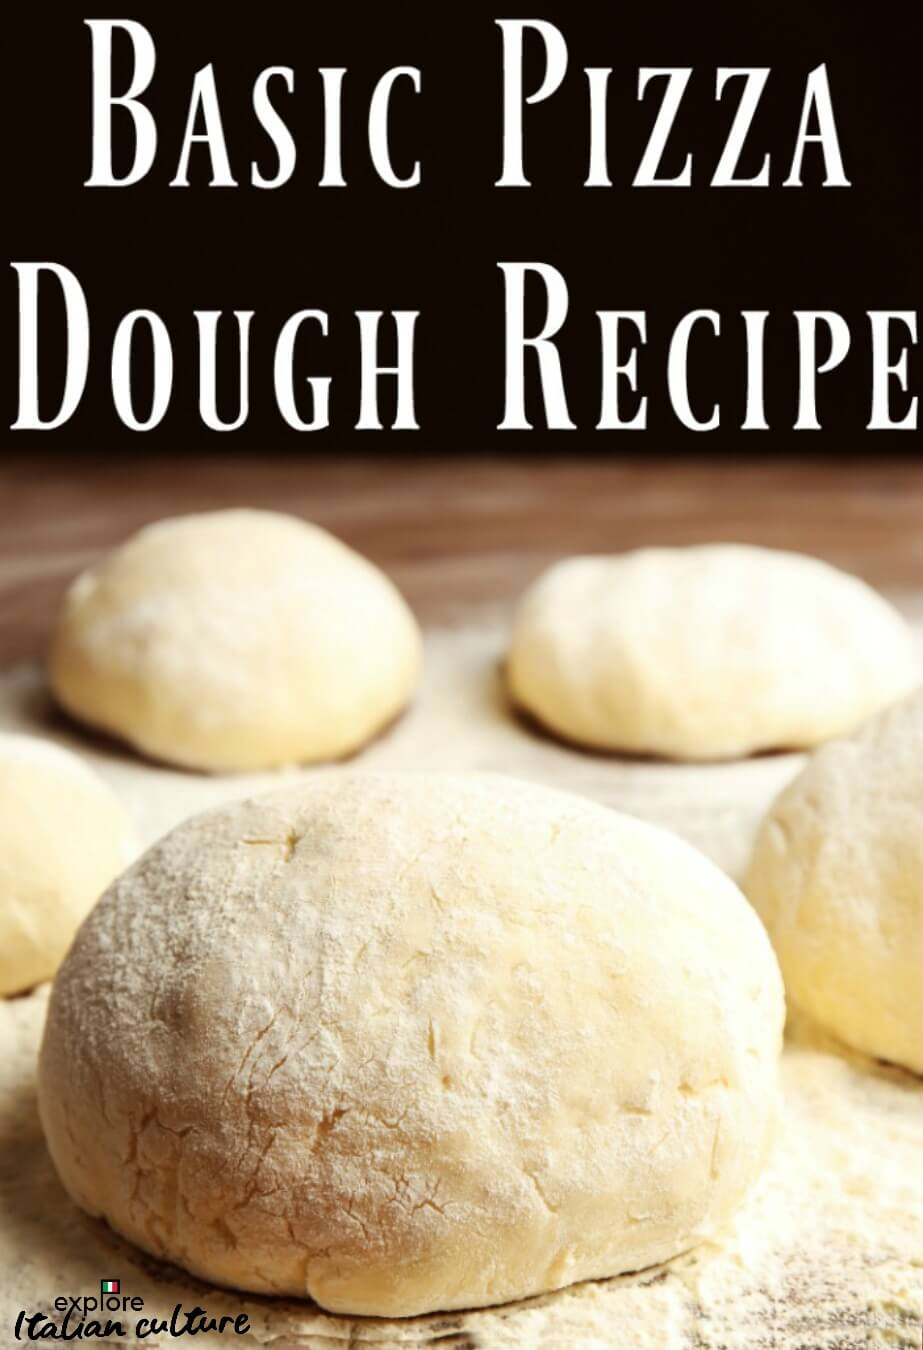 Basic Italian pizza dough recipe - click to see!